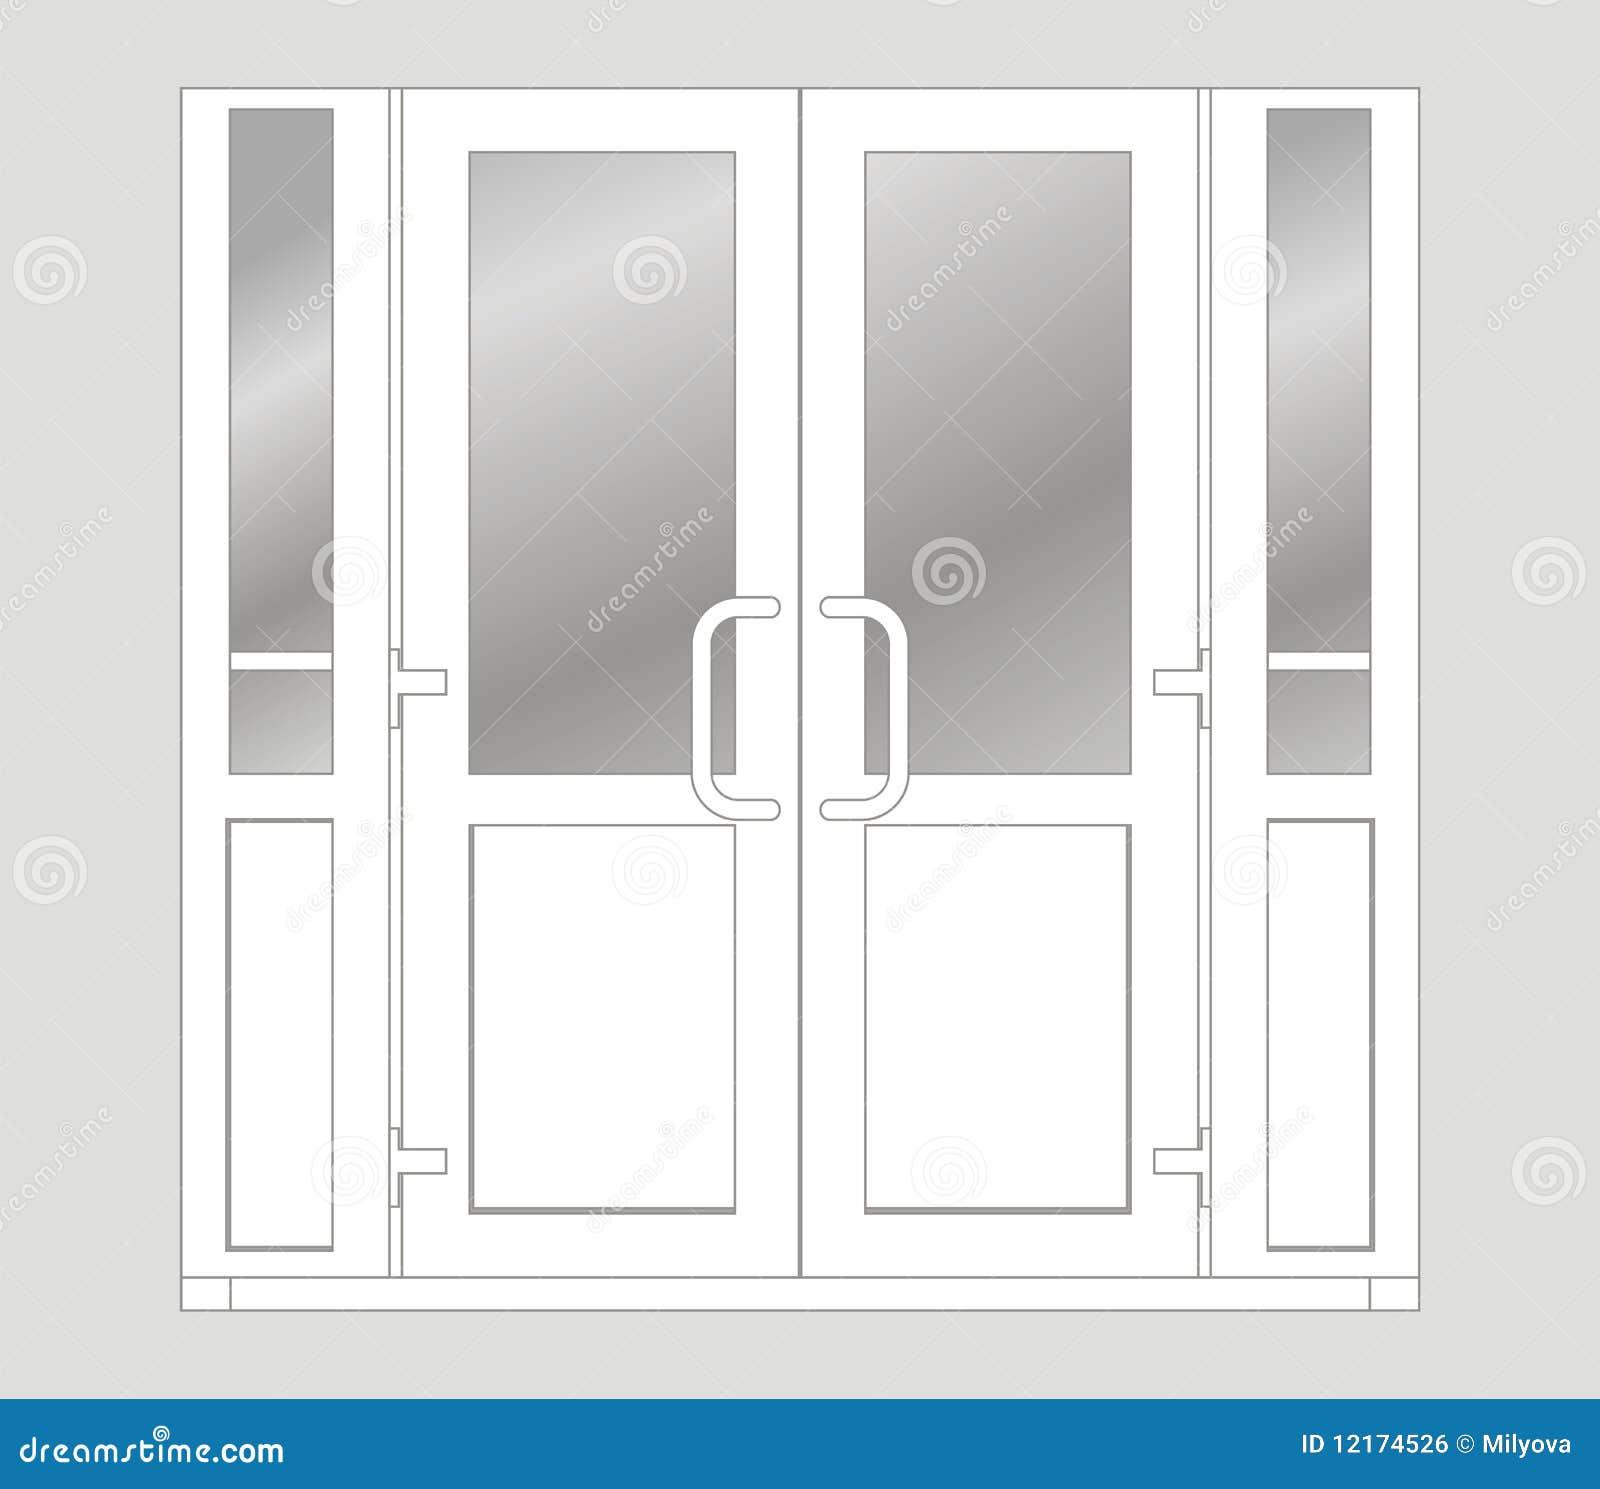 Plastic door  sc 1 st  Dreamstime.com & Plastic door stock illustration. Illustration of isolated - 12174526